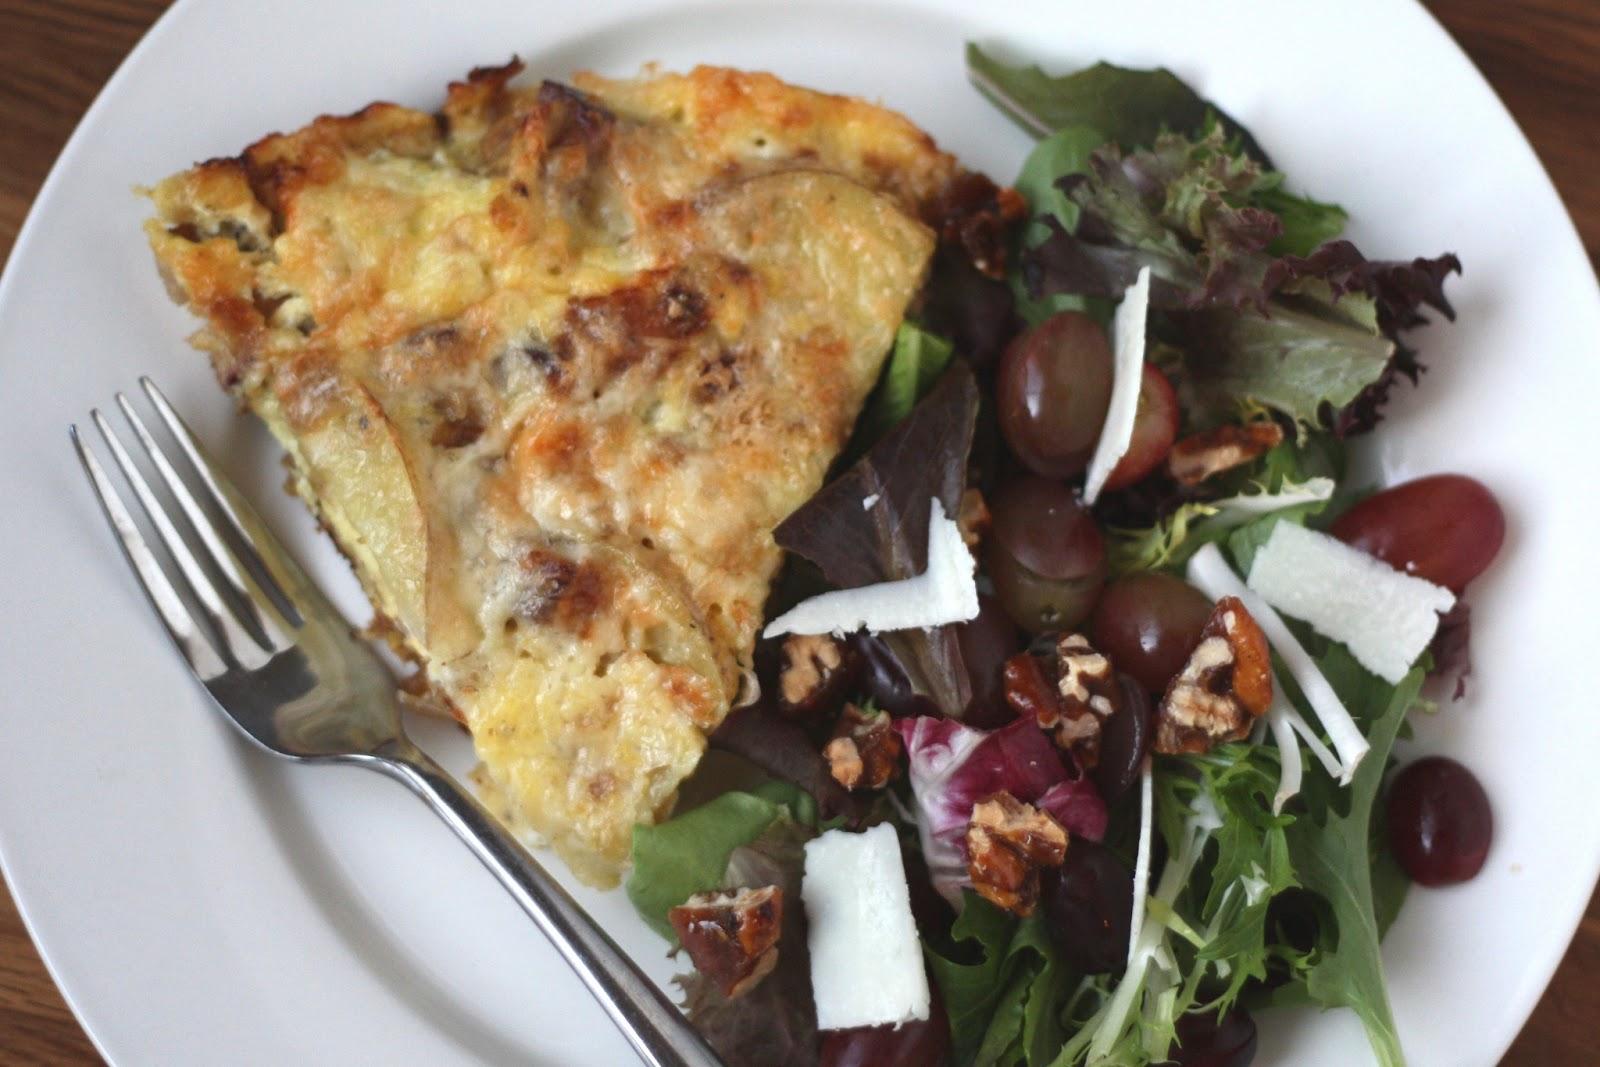 Sweet Potato And Caramelized Onion Frittata Recipes — Dishmaps